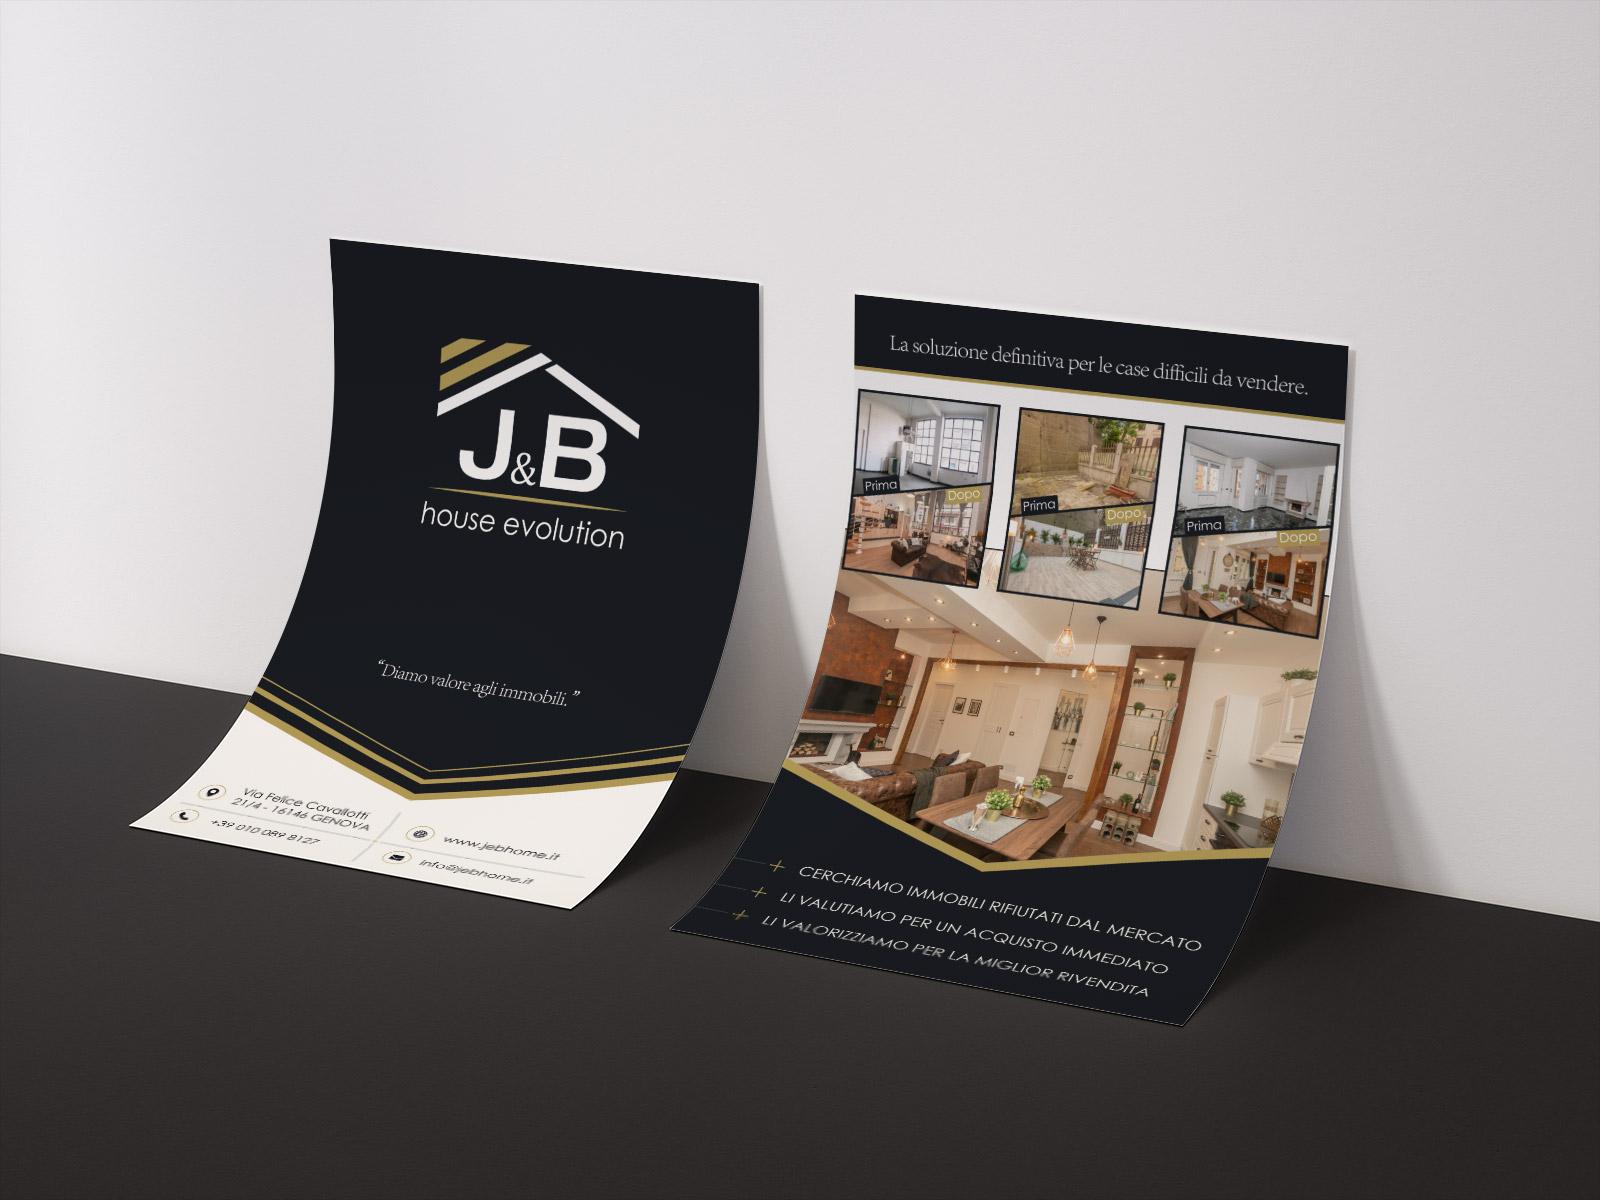 J&B House Evolution